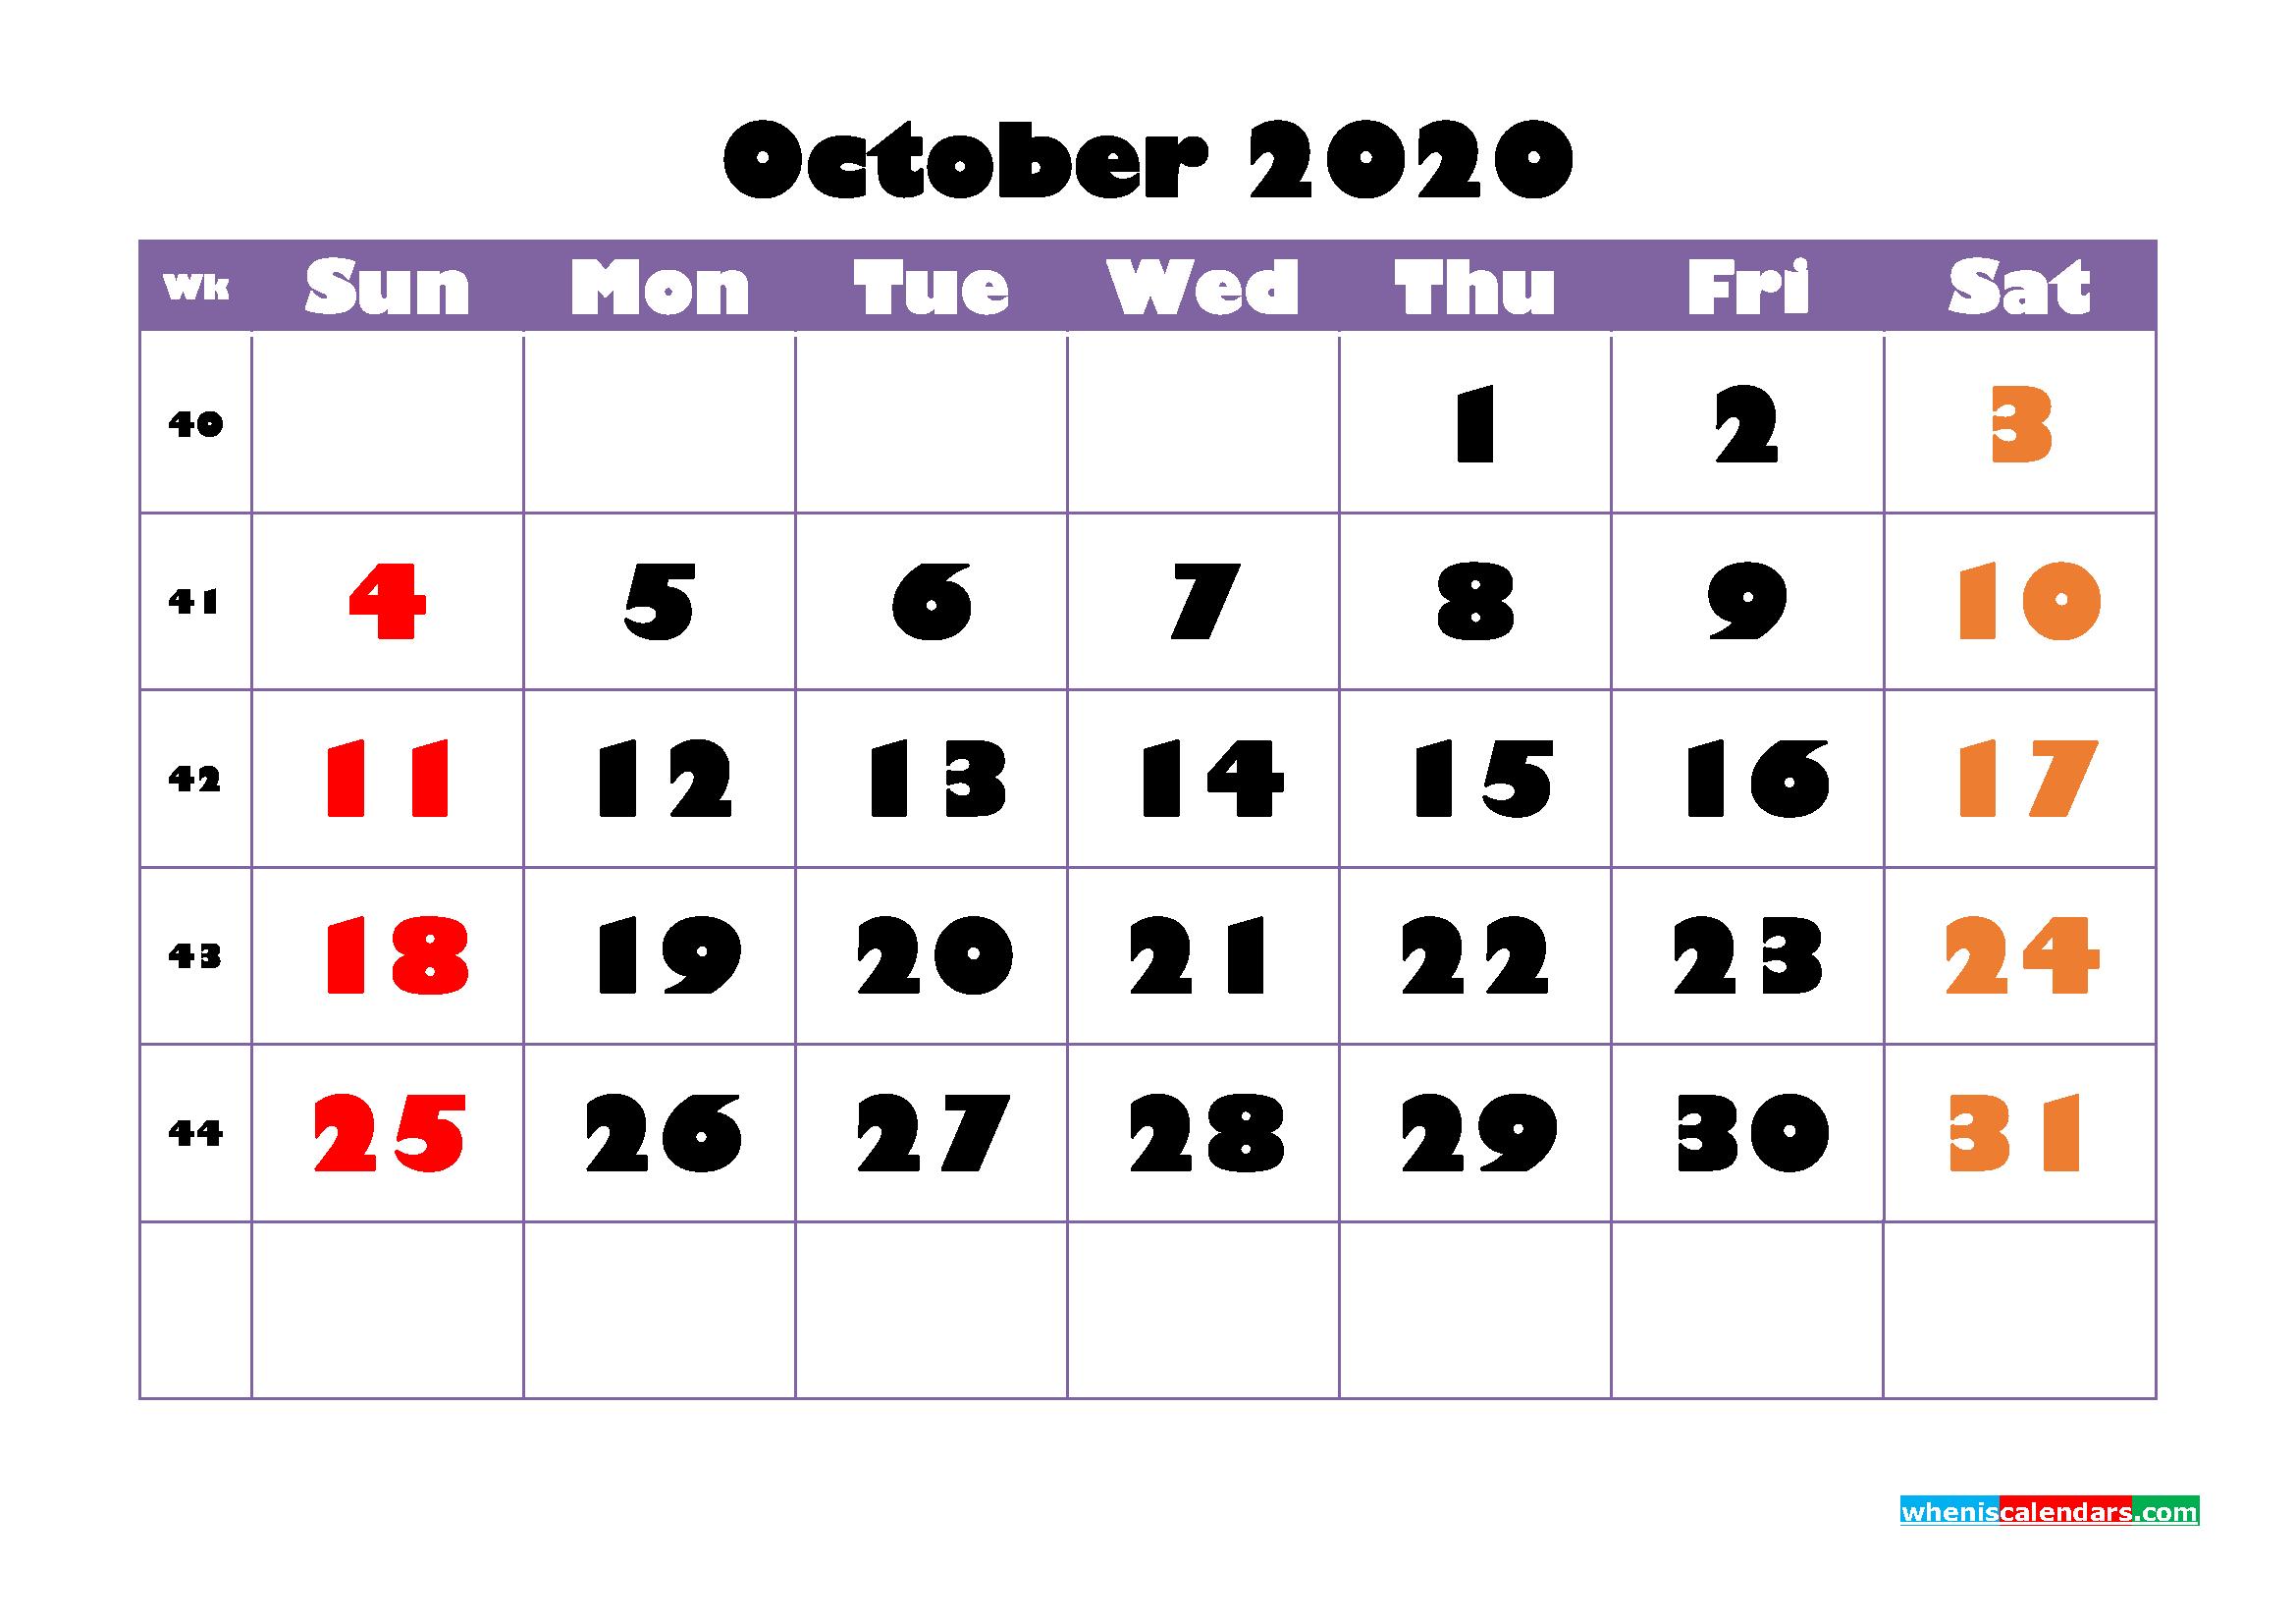 Free Printable October 2020 Calendar - No.m20b754